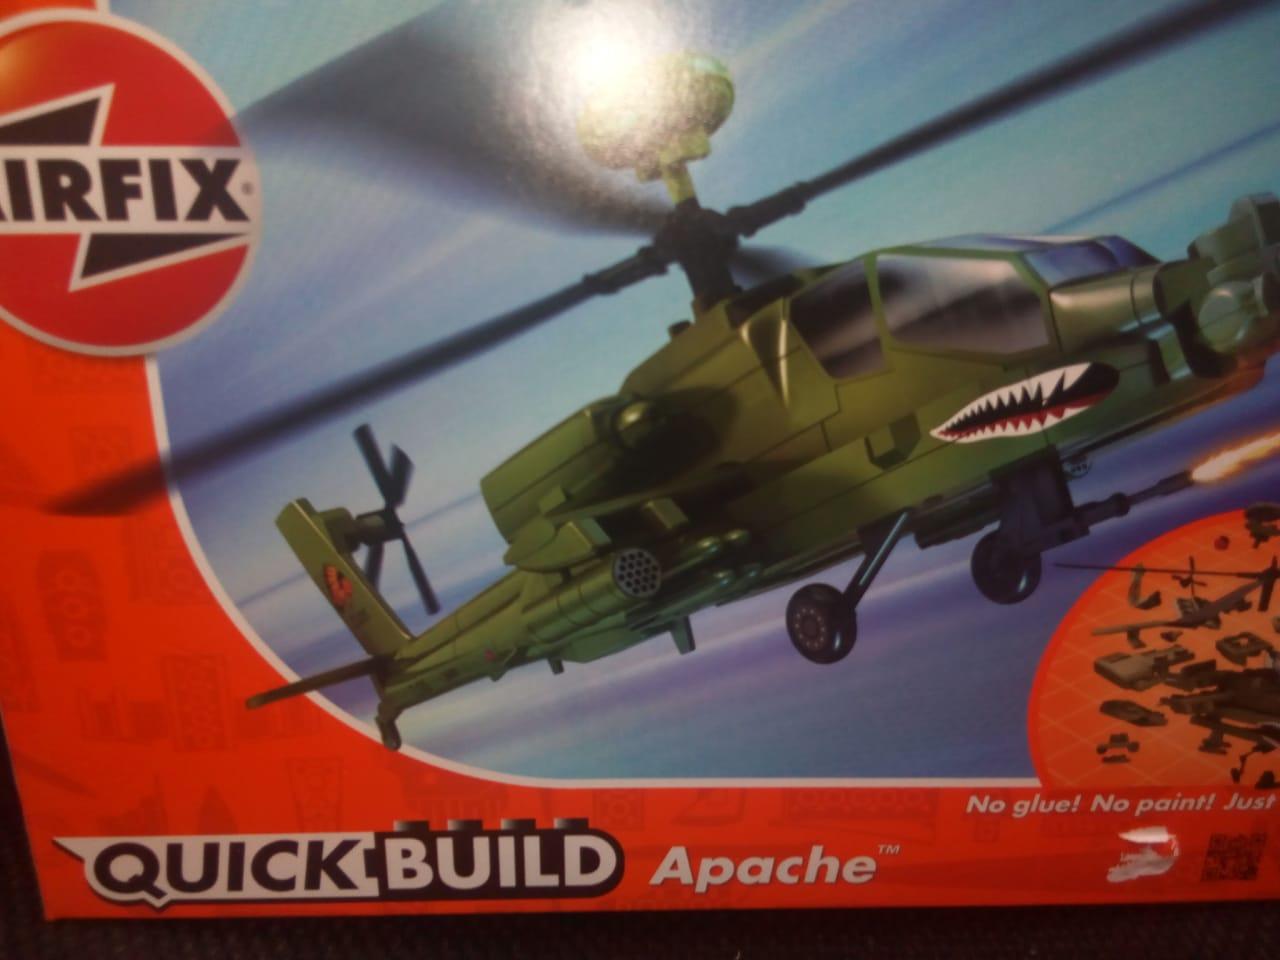 QUICK BUILD APACHE